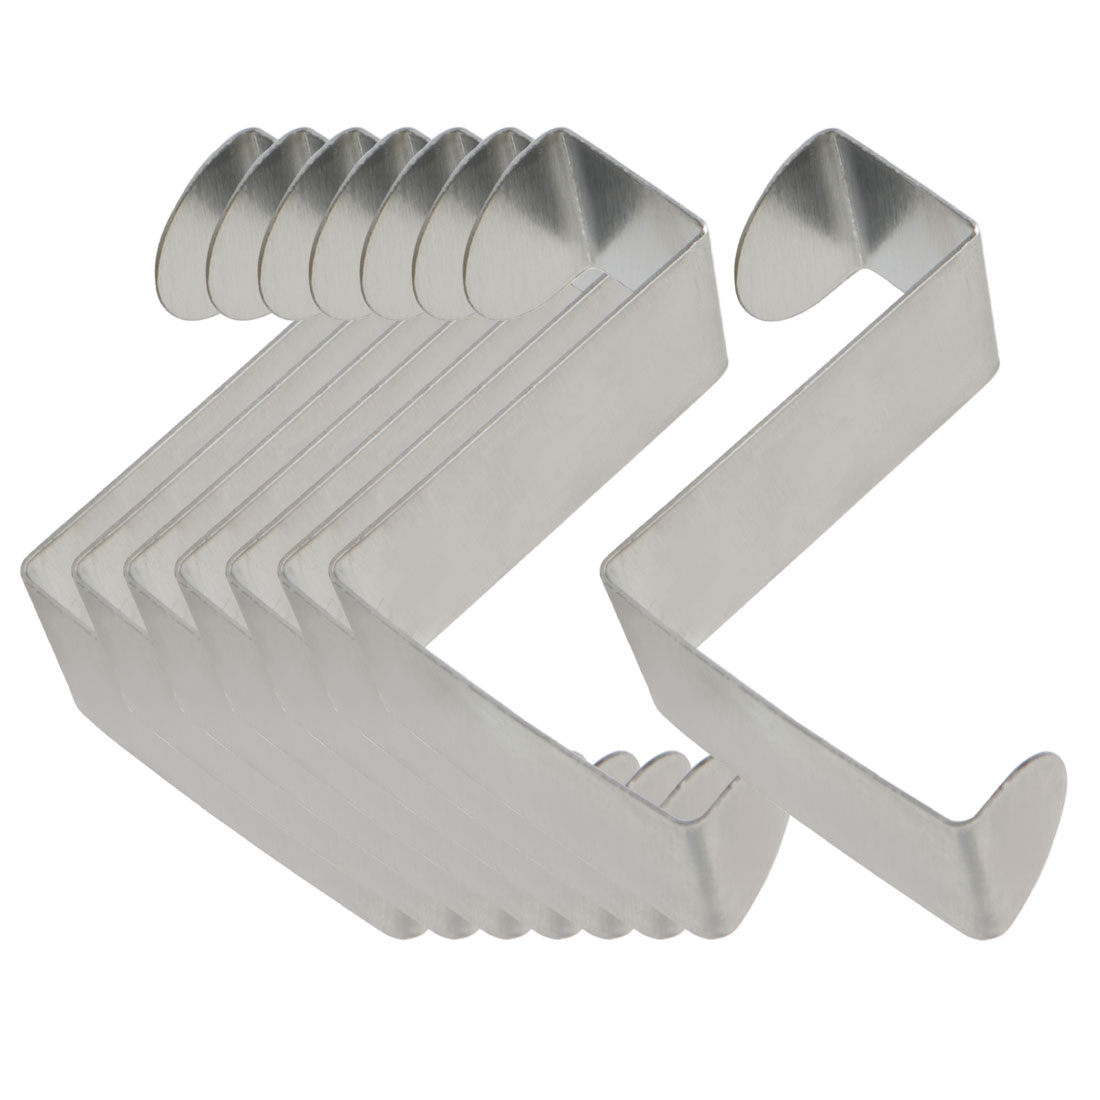 8pcs Z Shaped Hook Stainless Steel for Kitchenware Pot Utensils Coat Holders